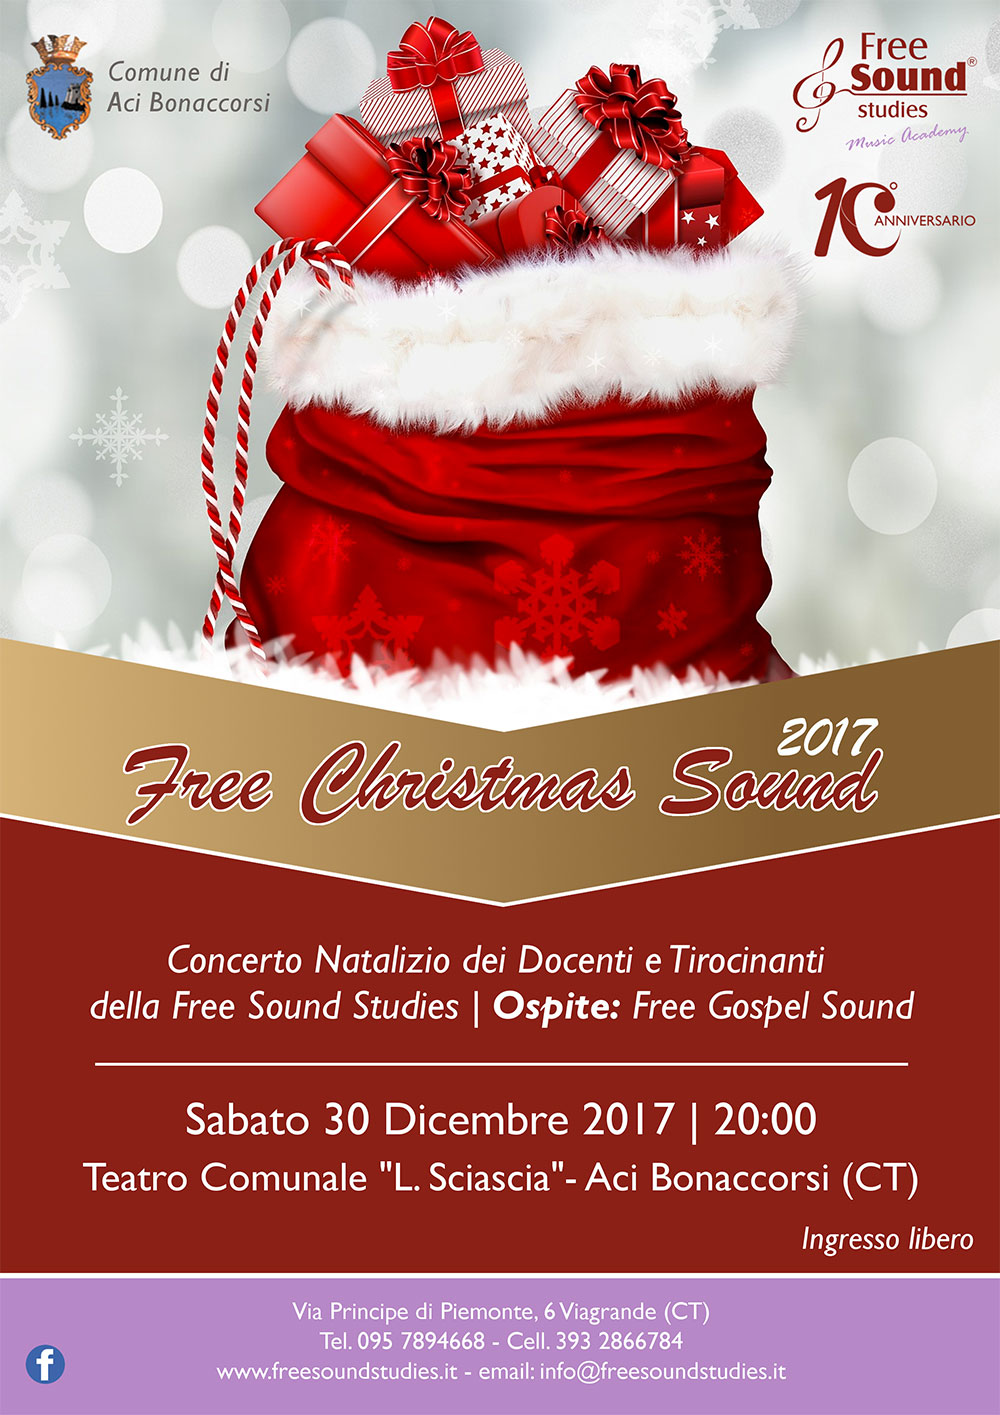 Free Christmas Sound